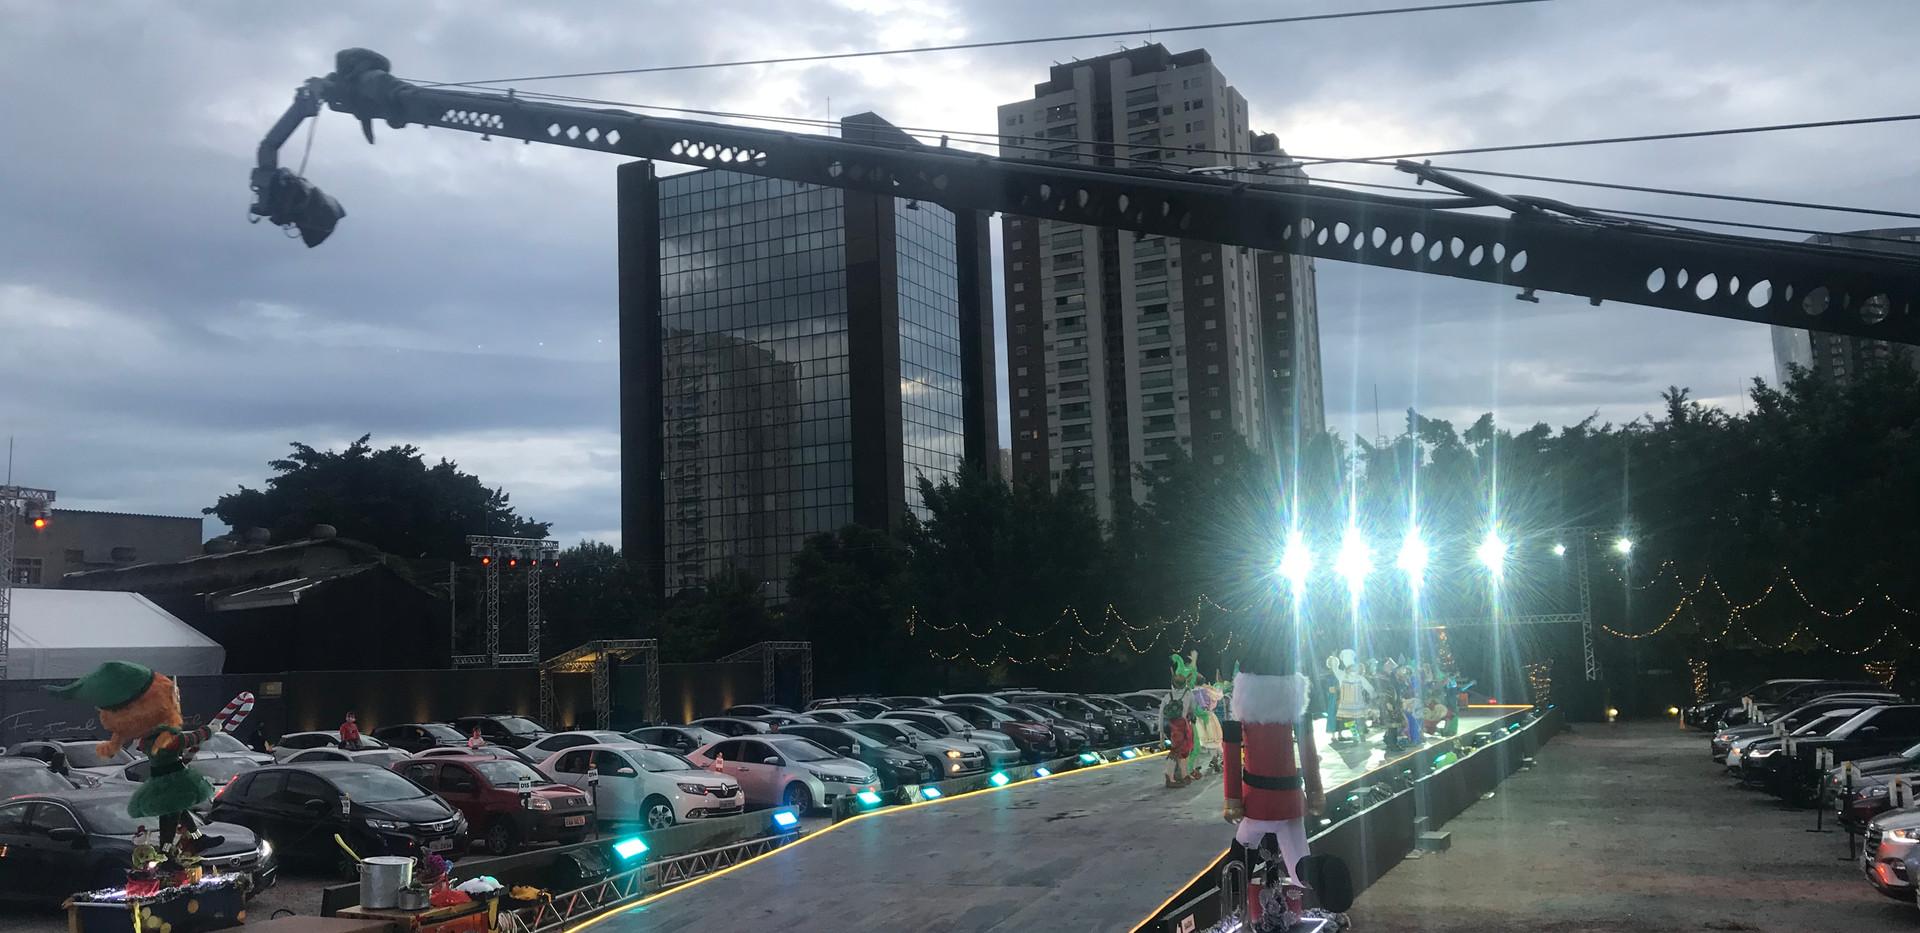 Espetáculo Natalizo Itaú Personalite Drivein